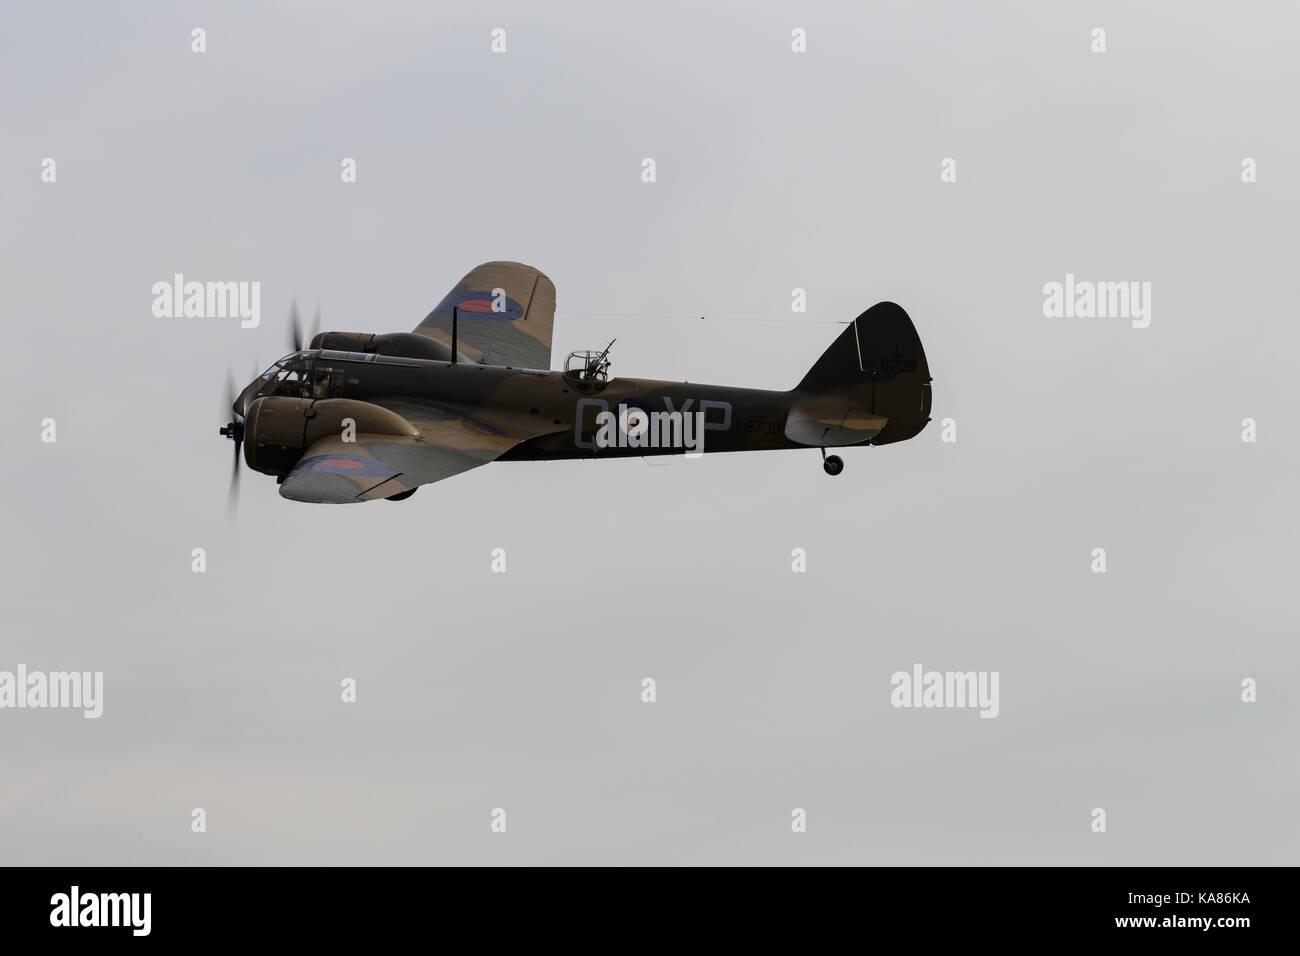 Duxford, UK. 24th Sep, 2017. A Bristol Blenheim MK1 in flight at the Duxford Battle of Britain Air Show in Duxford, Stock Photo